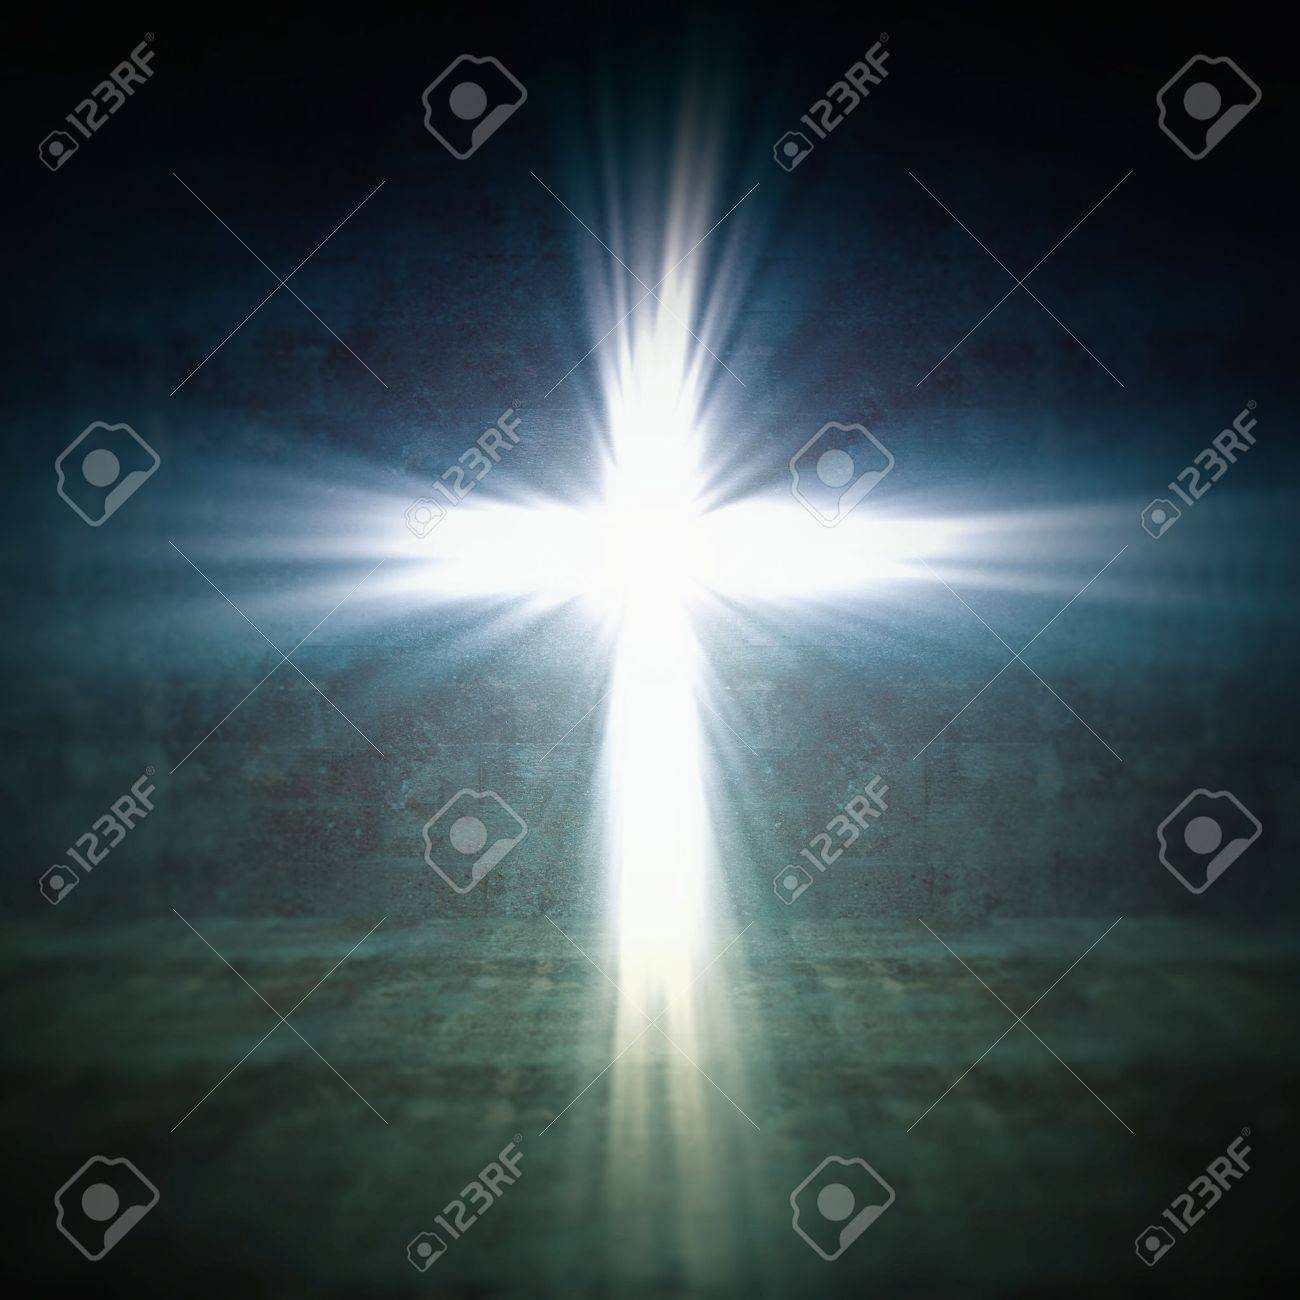 3d image of cross of light Stock Photo - 11289914